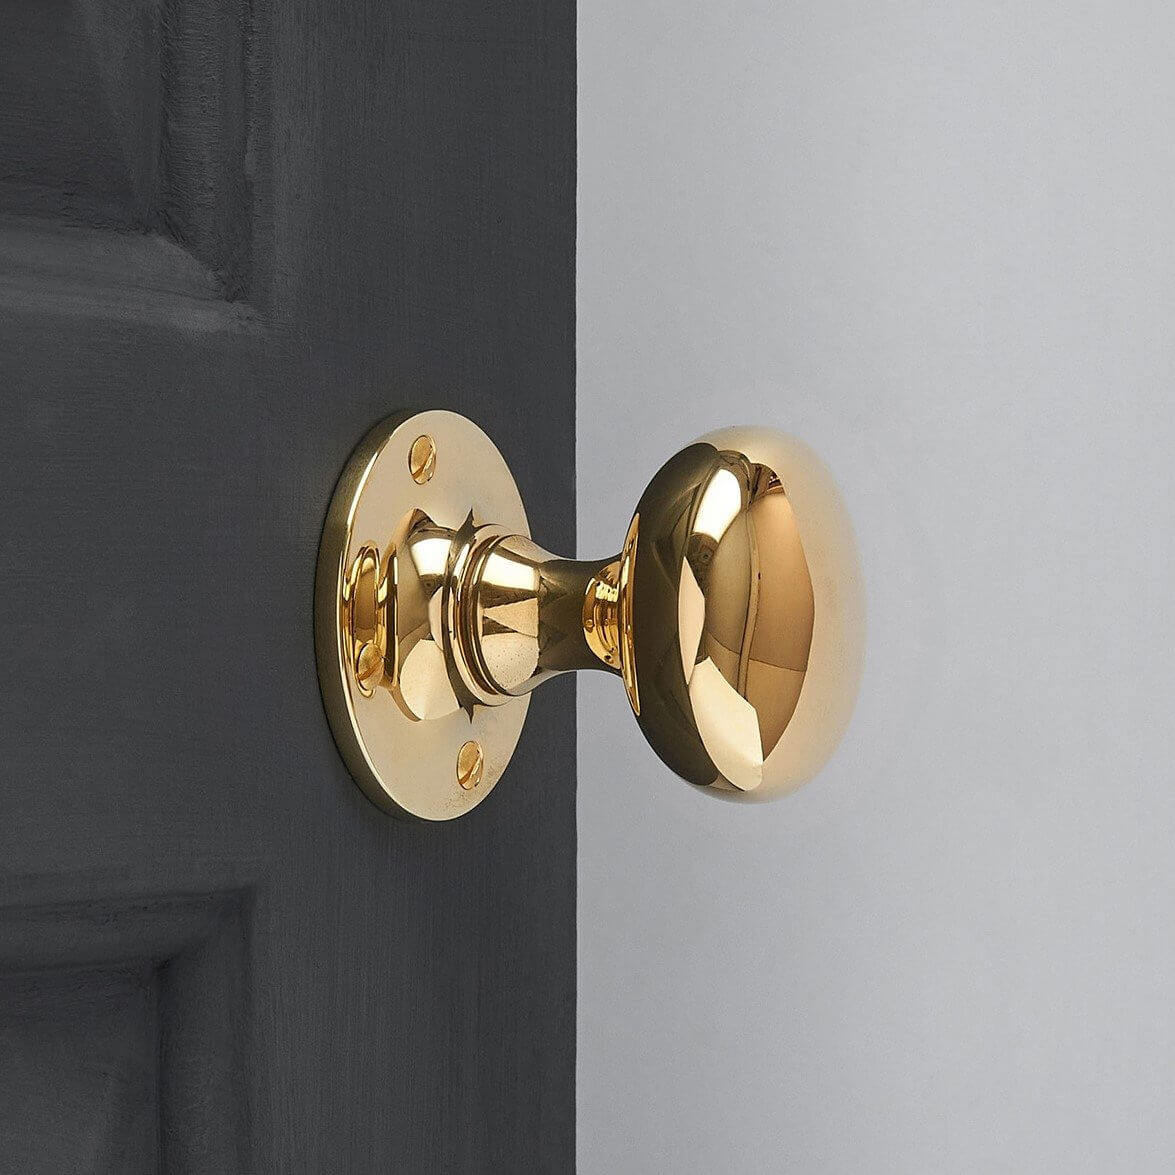 Cushion Door Knobs (Pair) - Brass